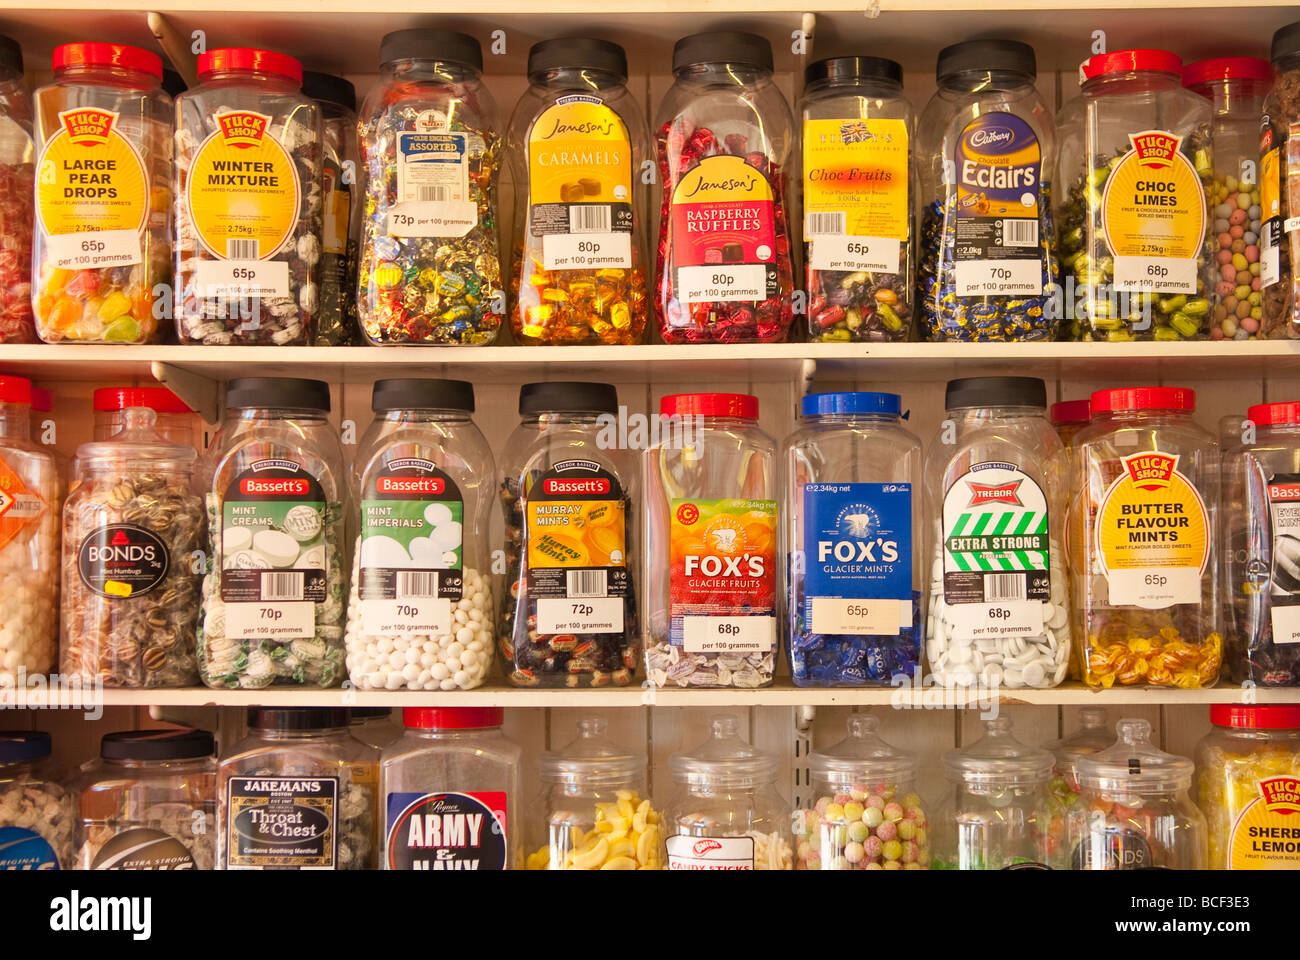 Uk online sweet shop